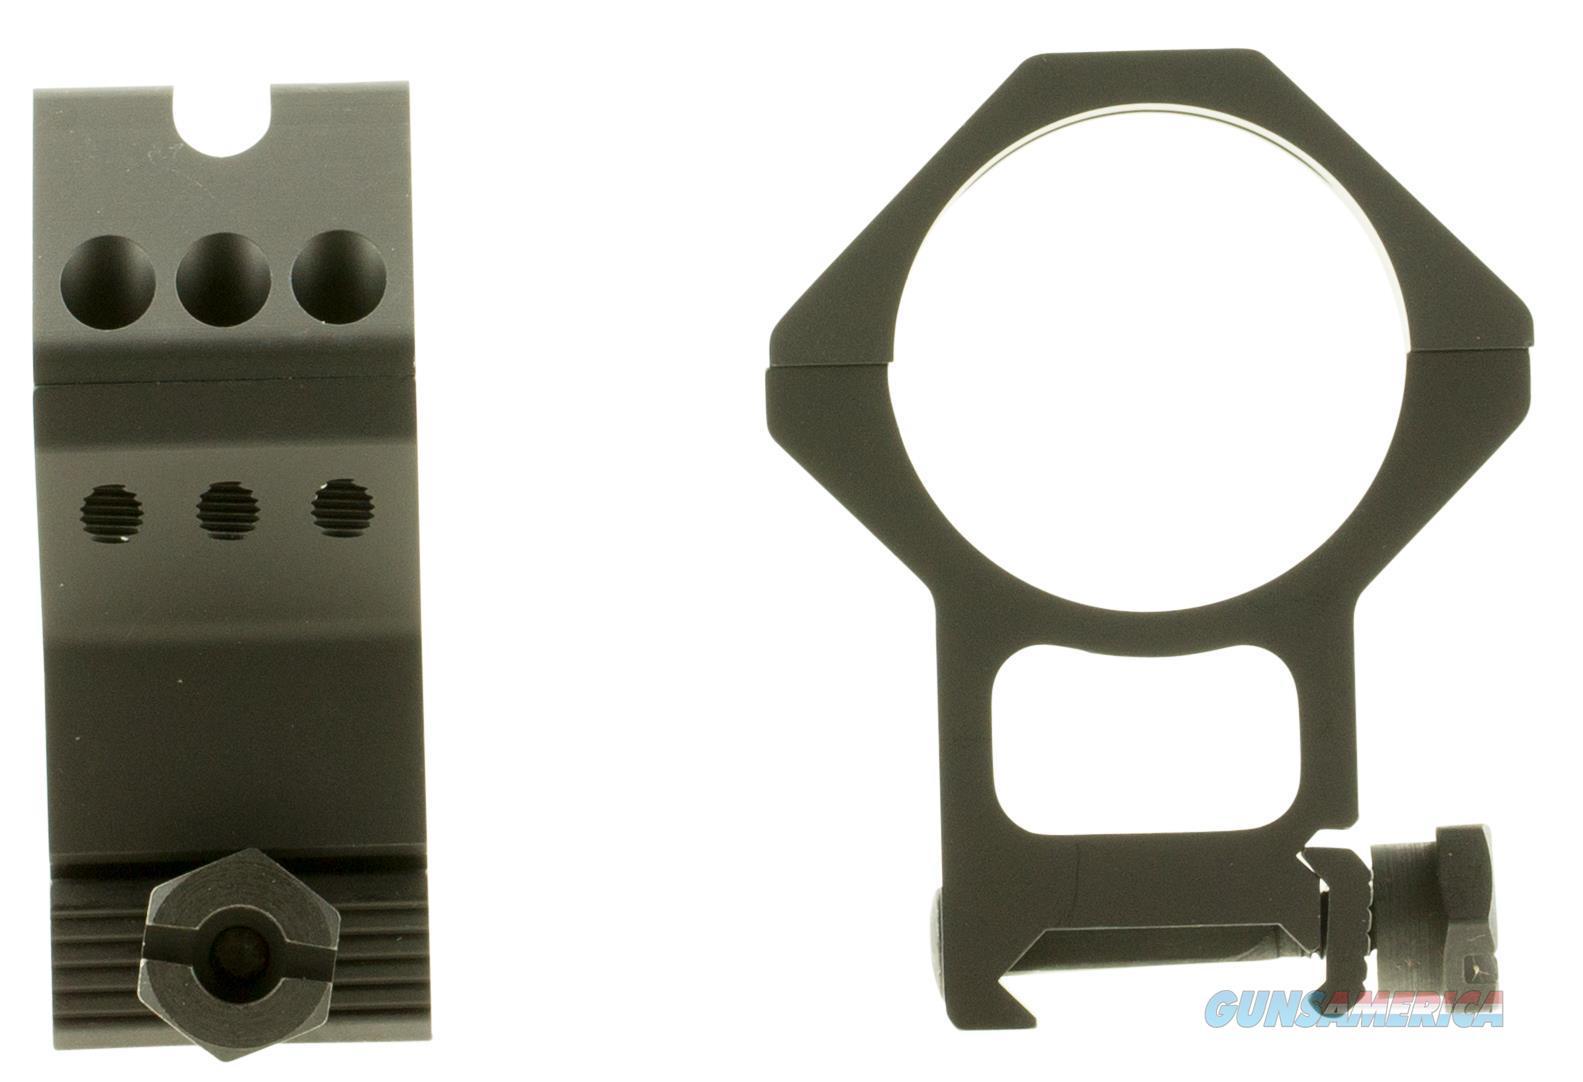 Weaver Mounts 99686 Six-Hole Rings Ring Set 34Mm Xxhigh Black 99686  Non-Guns > Scopes/Mounts/Rings & Optics > Mounts > Other